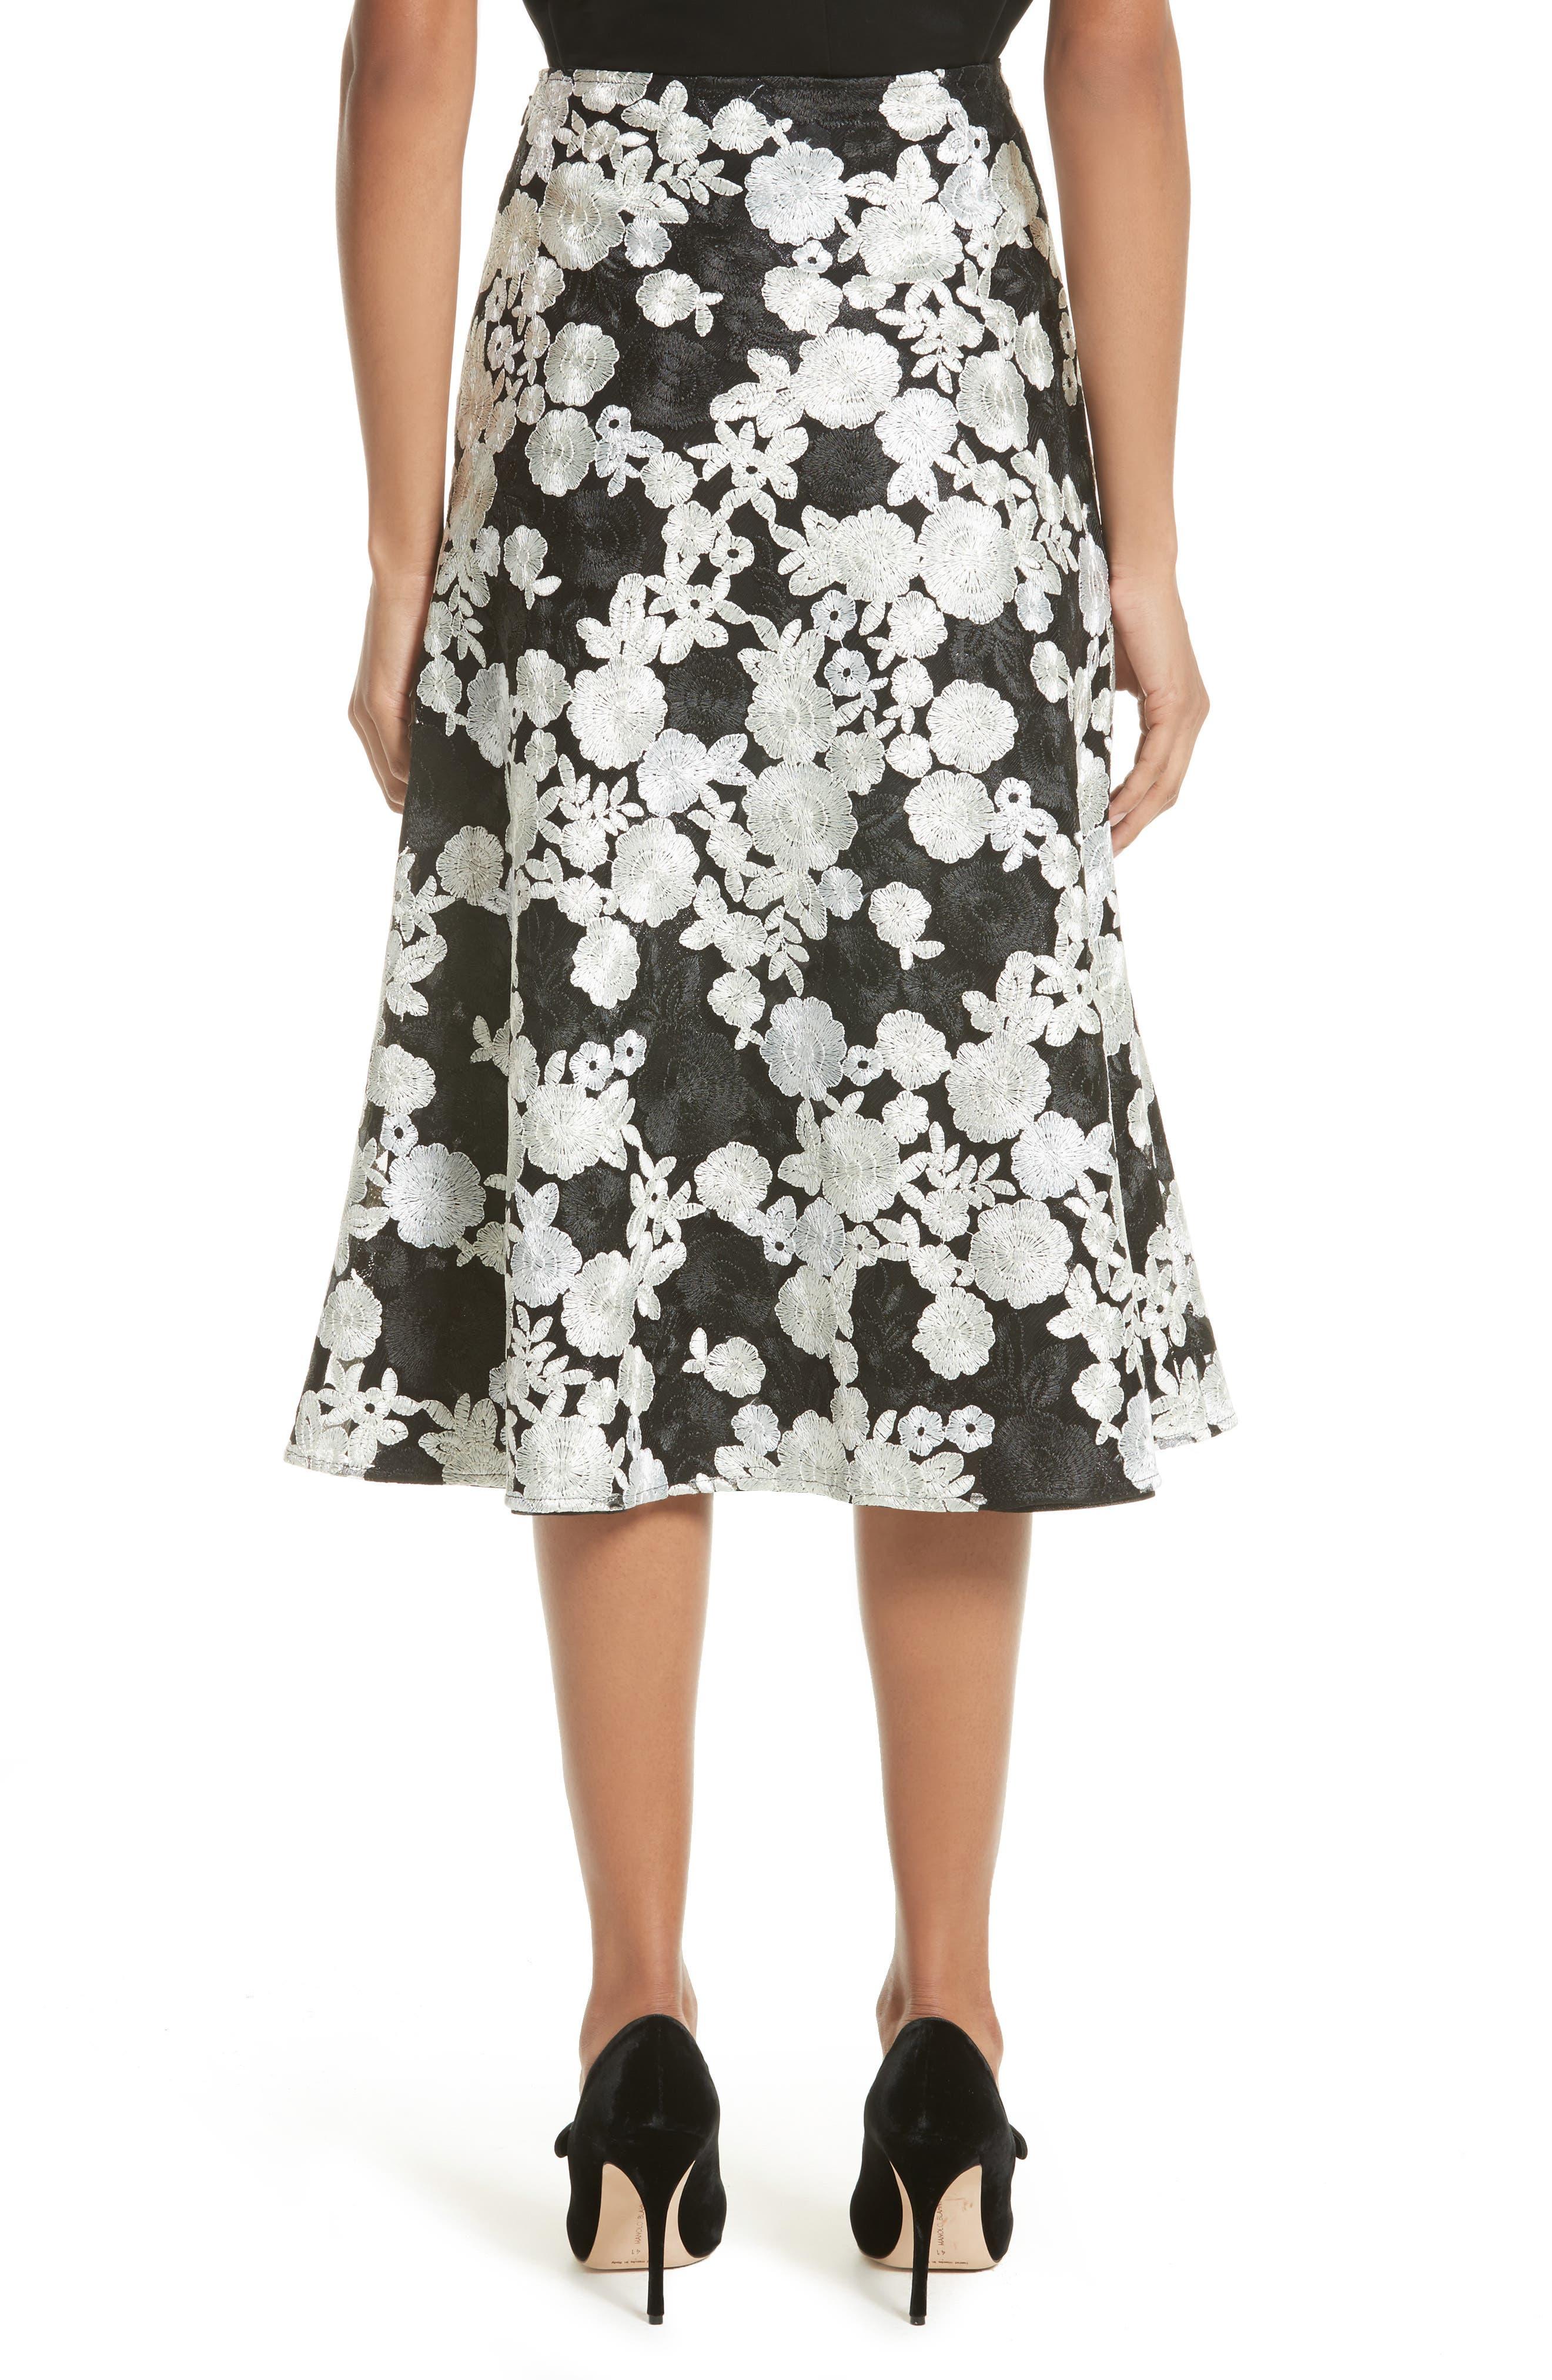 St. John Floral Embroidered Flared Skirt,                             Alternate thumbnail 2, color,                             001